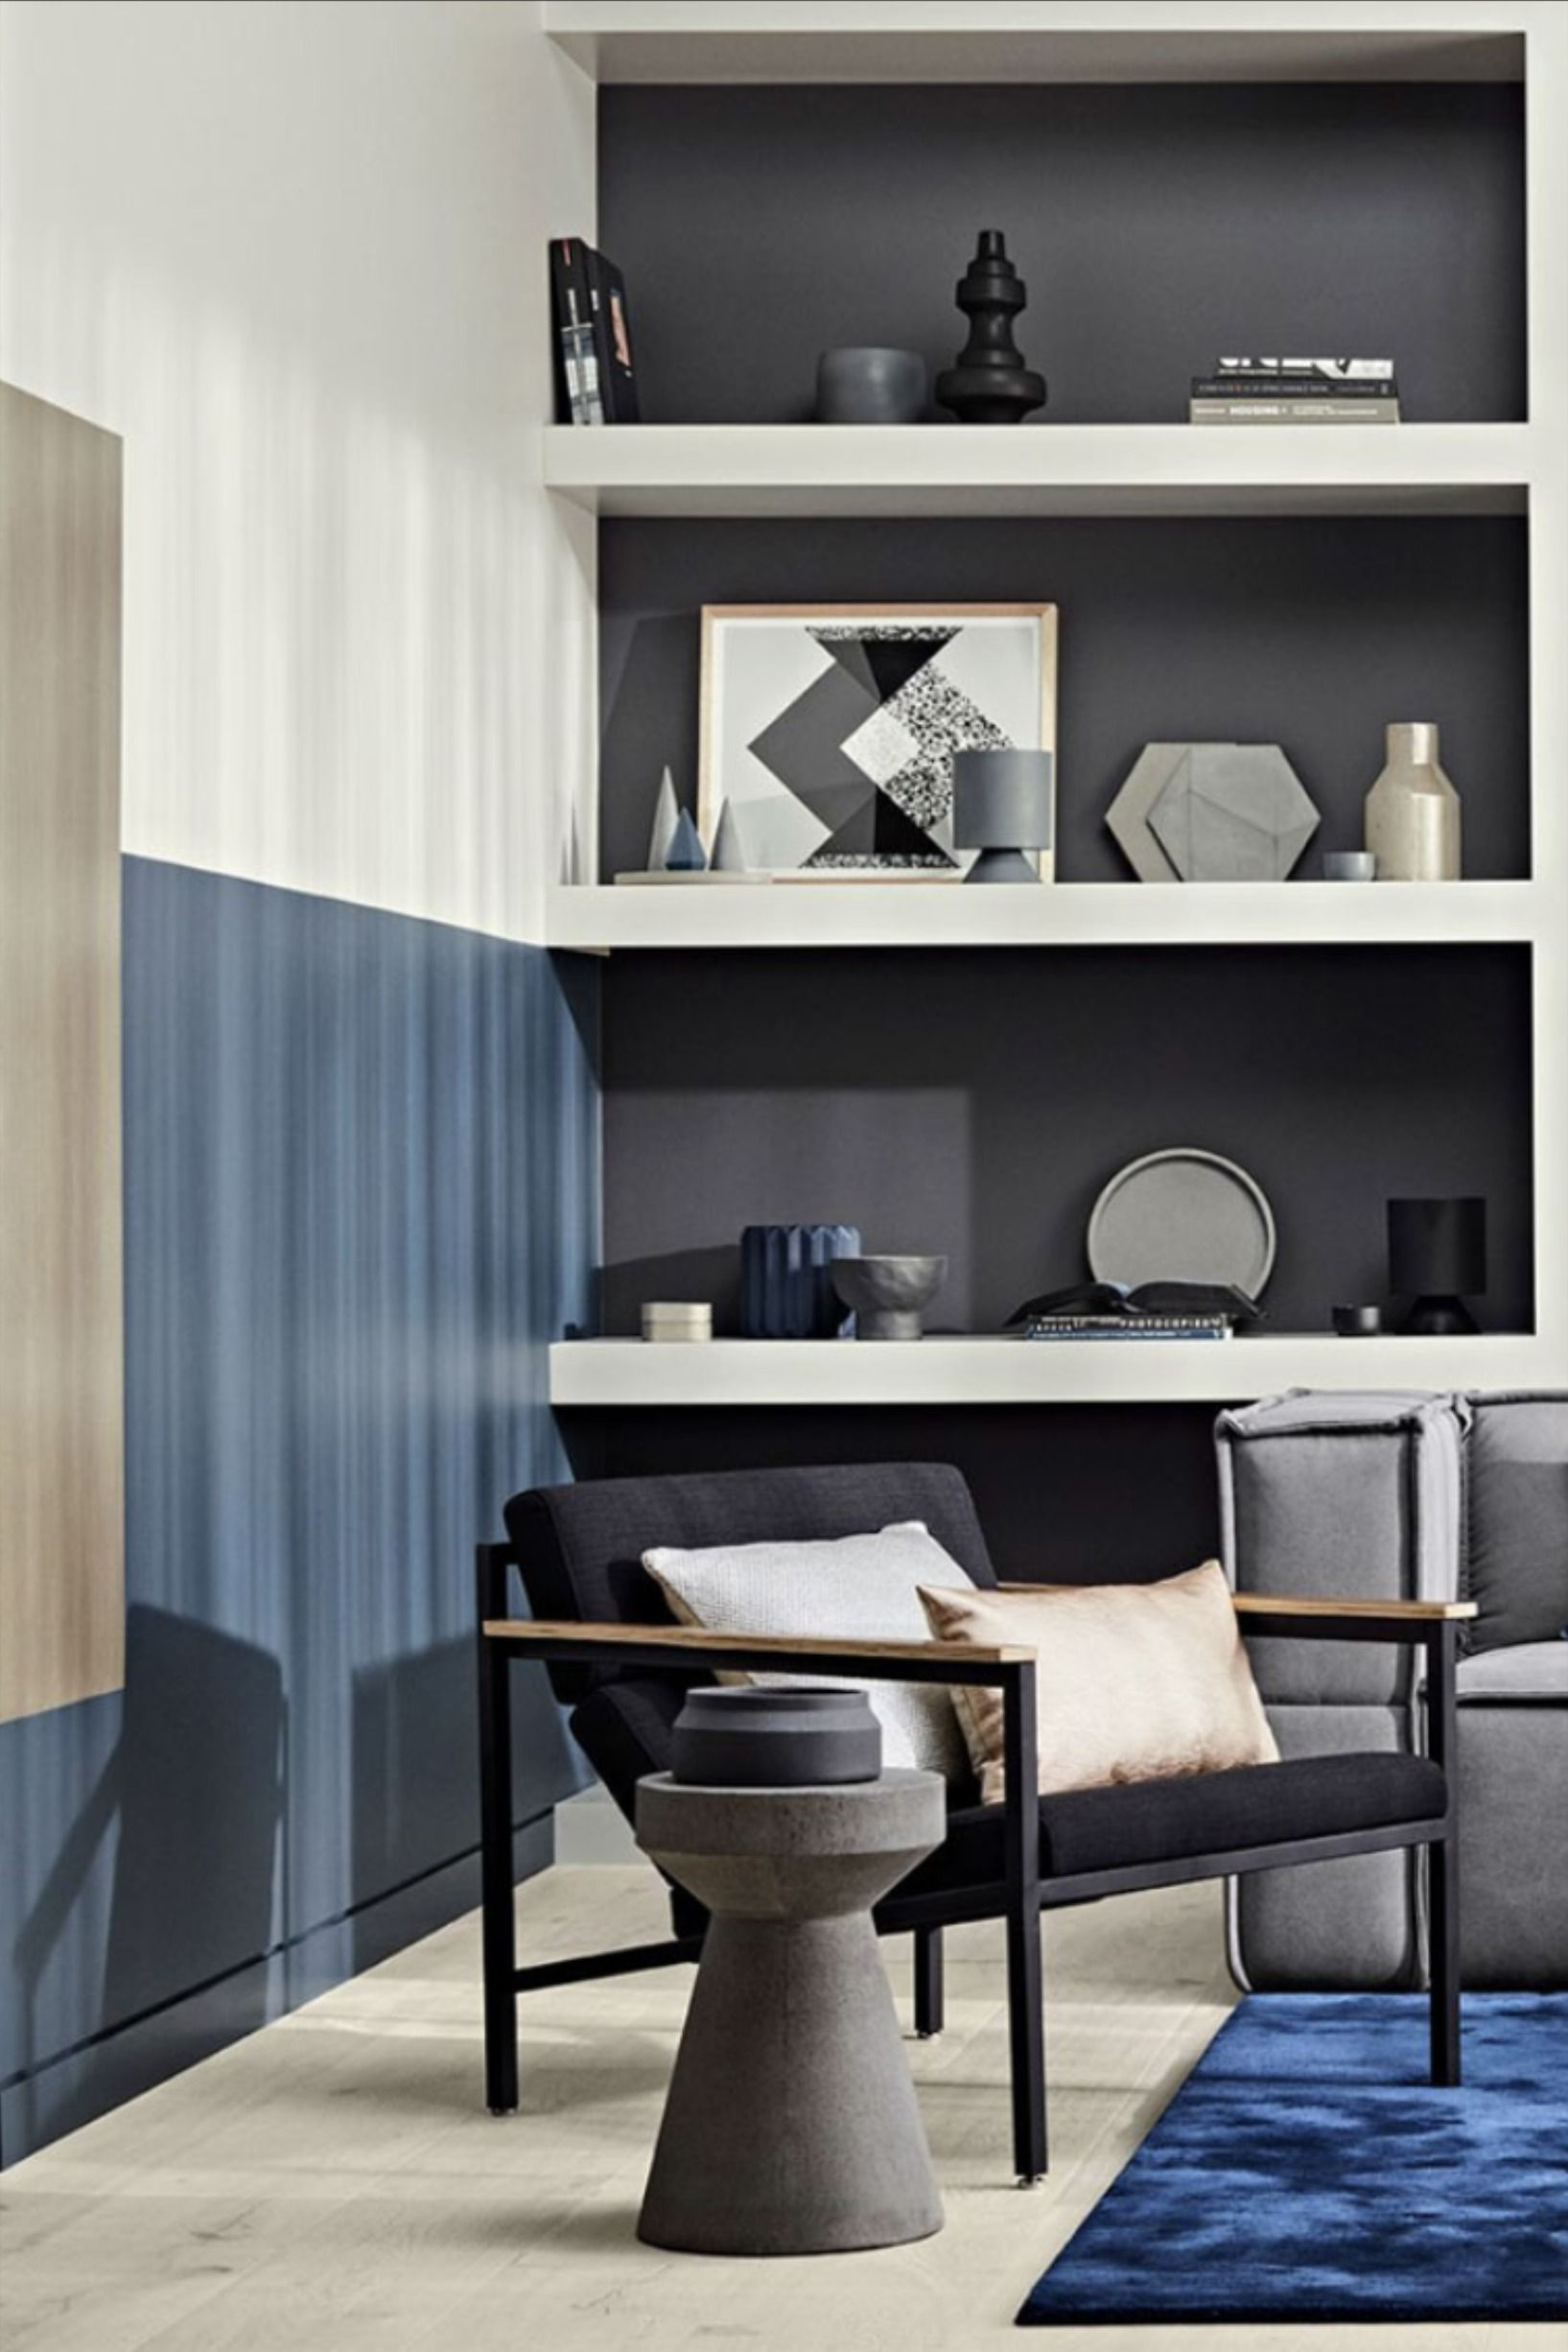 21 Raumdesign / Interior Design Ideen   raumdesign, design, raumideen